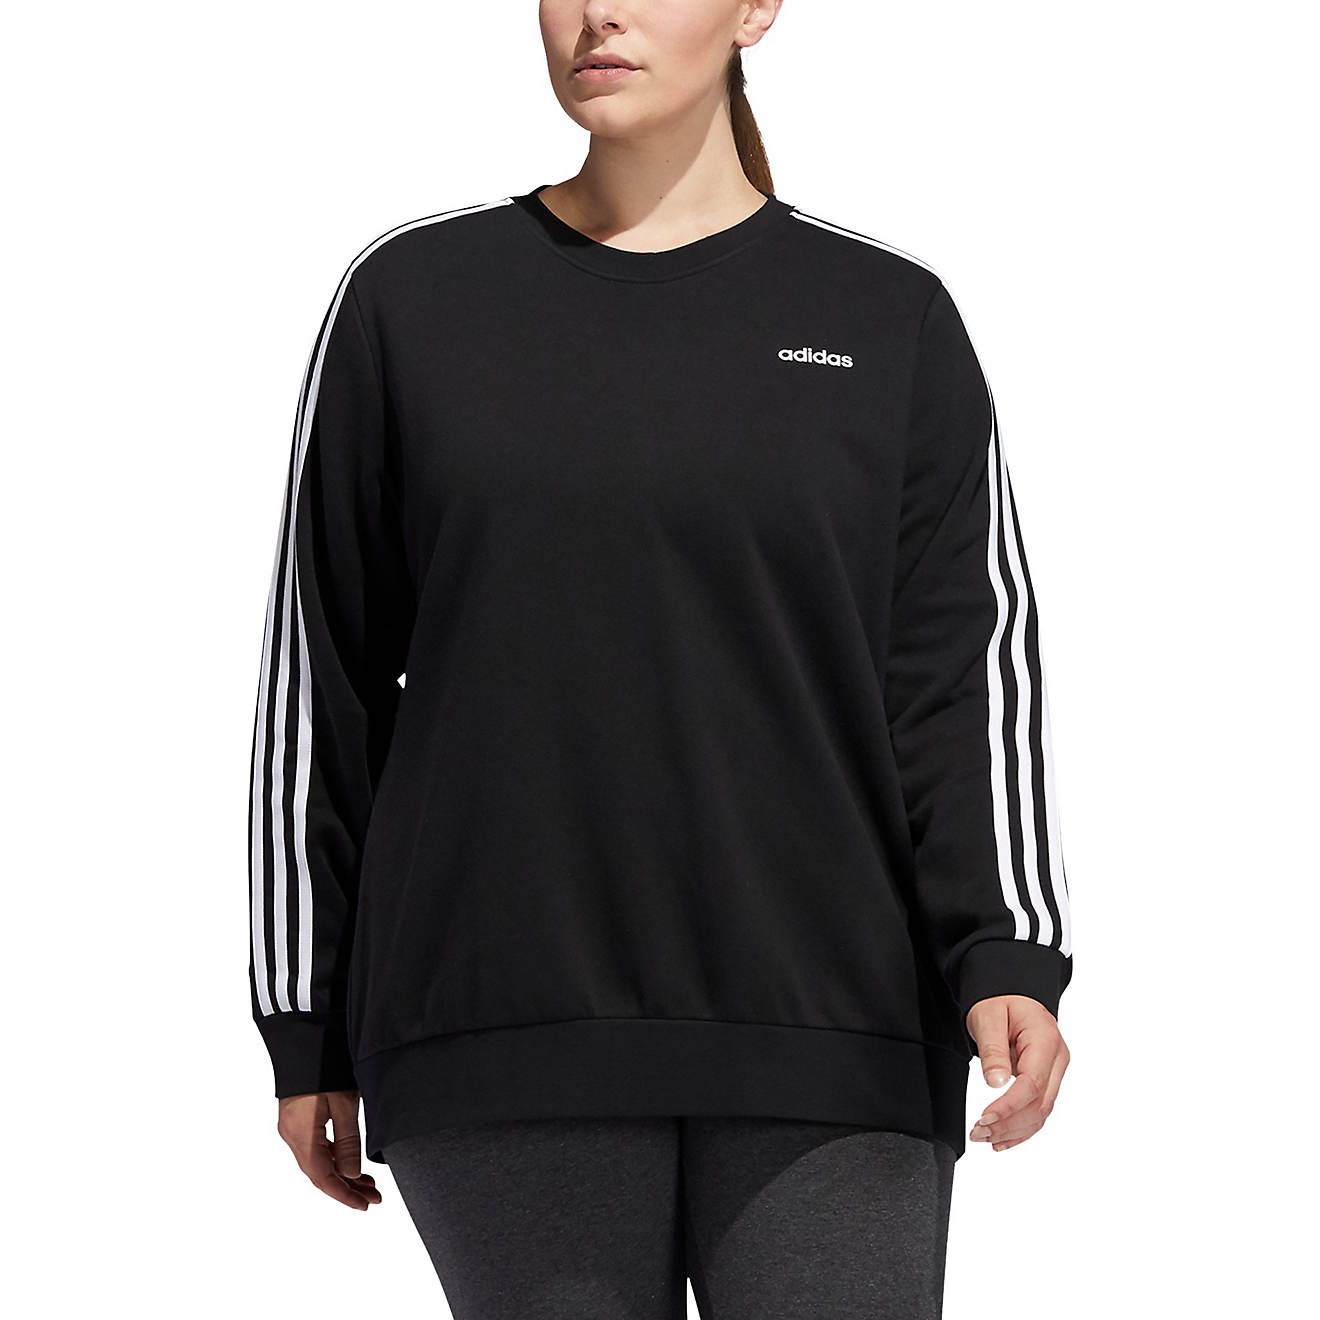 adidas Women's 3-Stripes Fleece Plus Size Sweatshirt